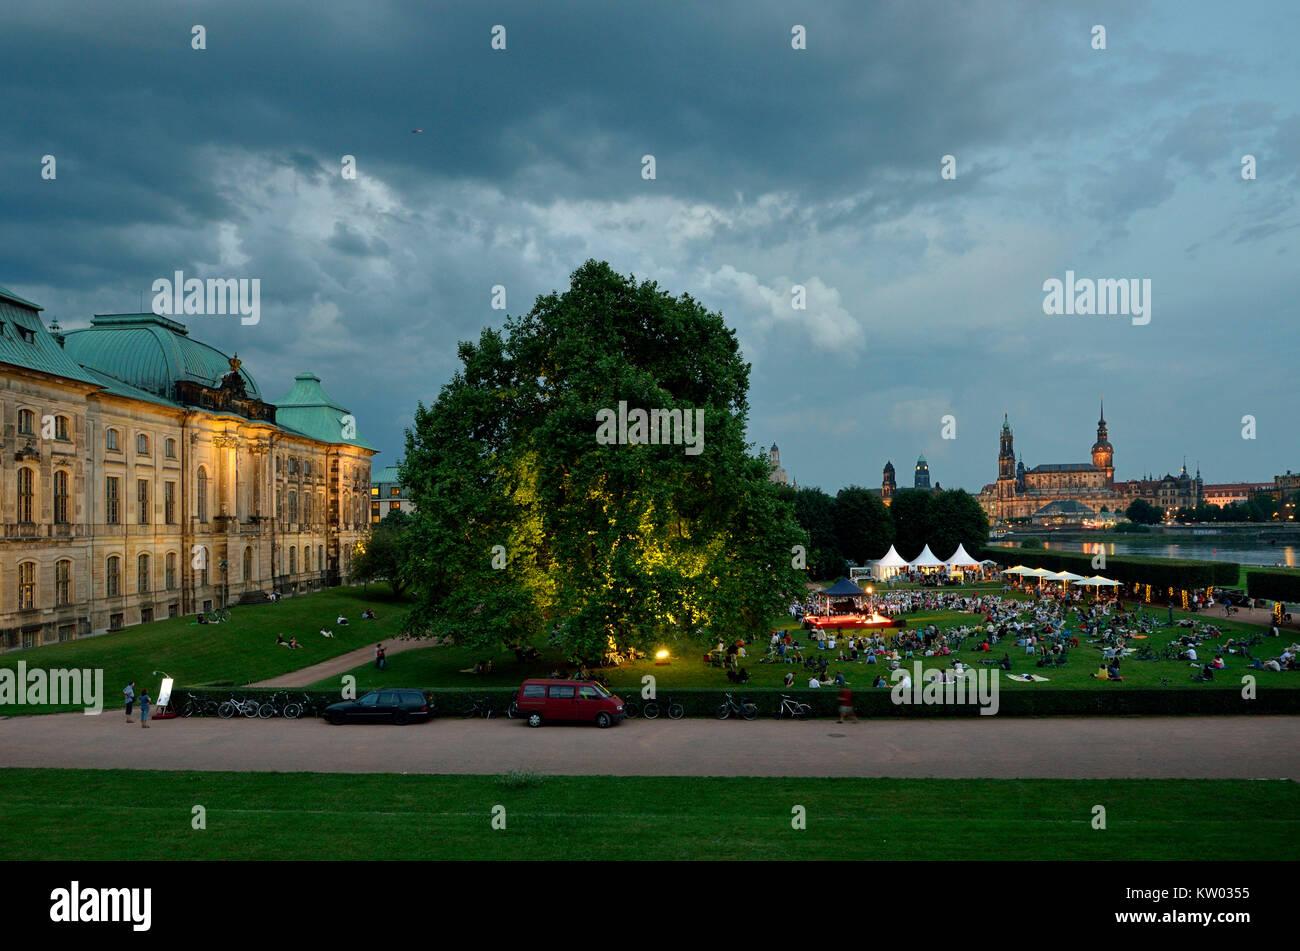 Dresden, Palace Sommer Konzert am Ufer des Königs, Palaissommerkonzert am Königsufer Stockbild